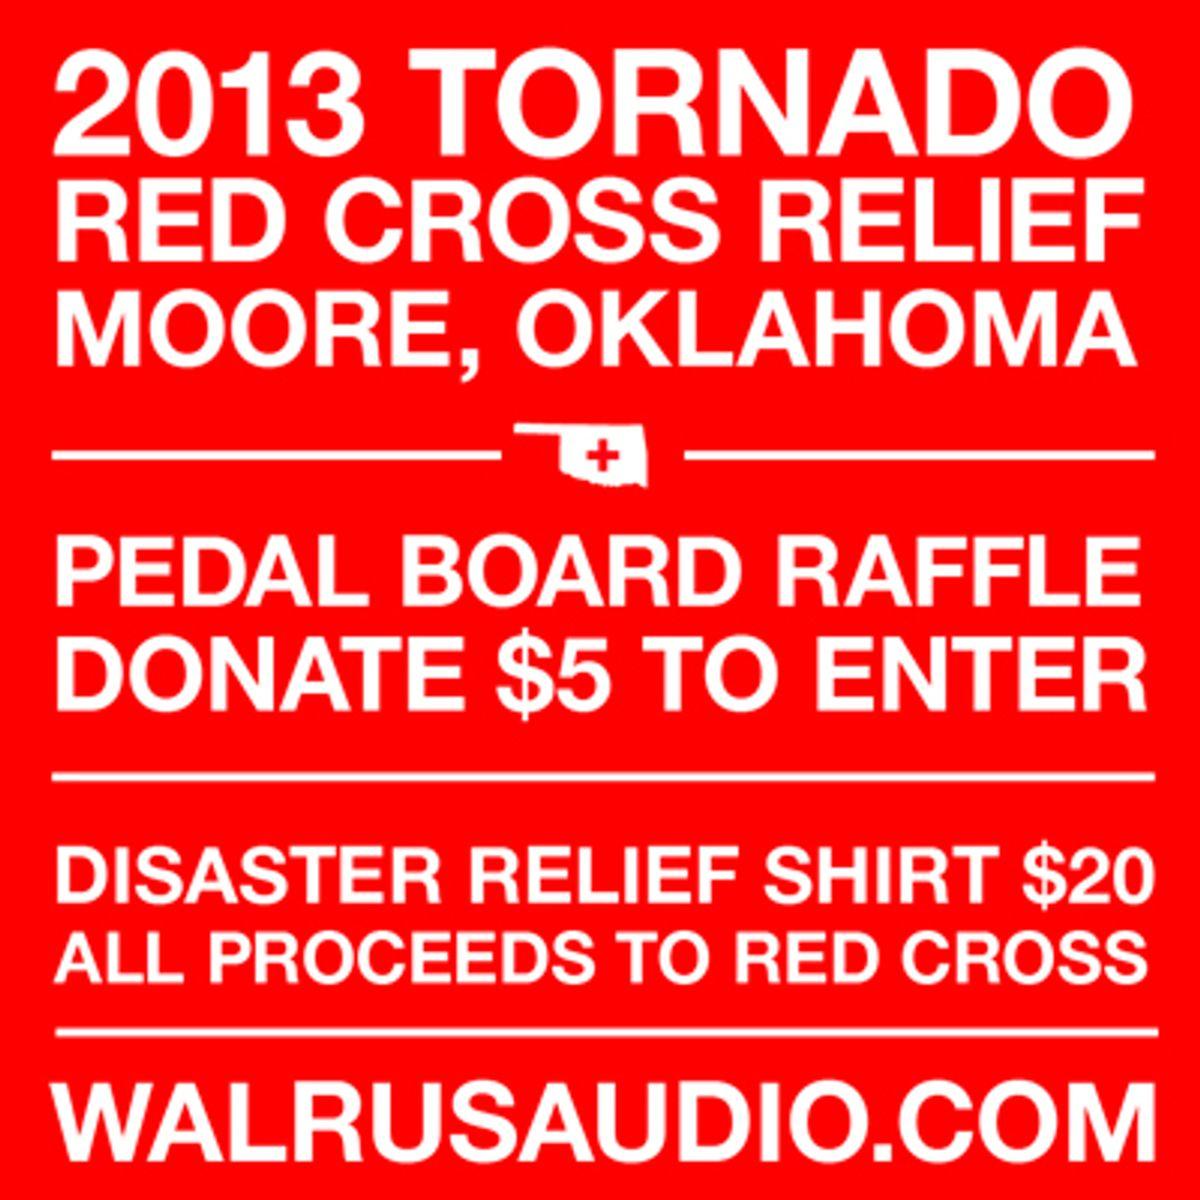 Walrus Audio Hosts Relief Fund for Oklahoma Tornado Victims